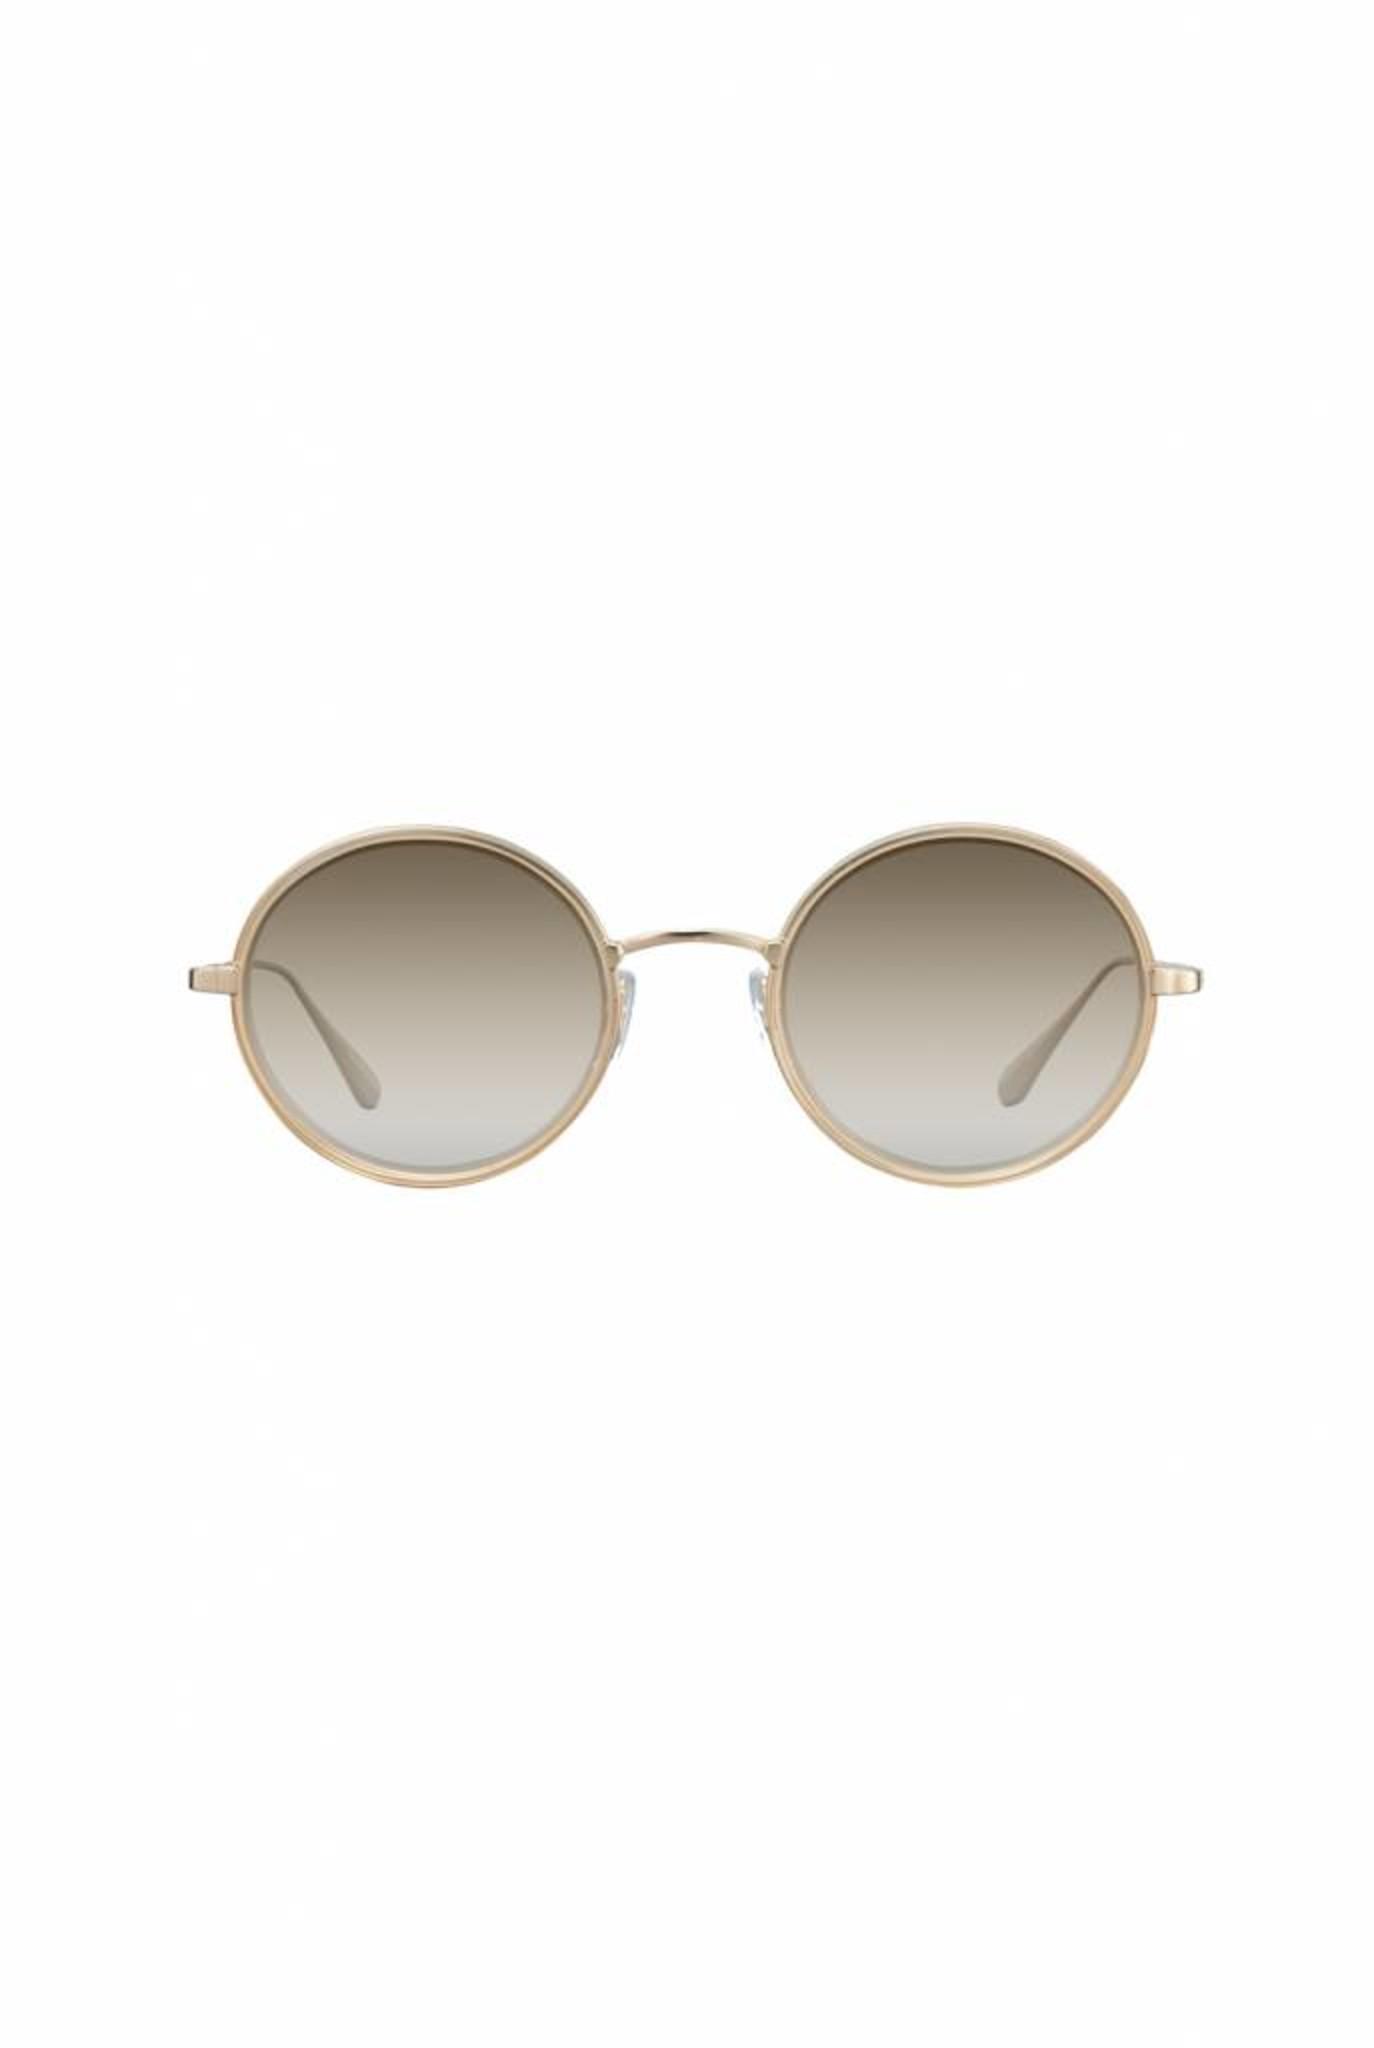 Playa sunglasses Blonde-Gold/Semi-Flat Sunridge Gradient Mirror